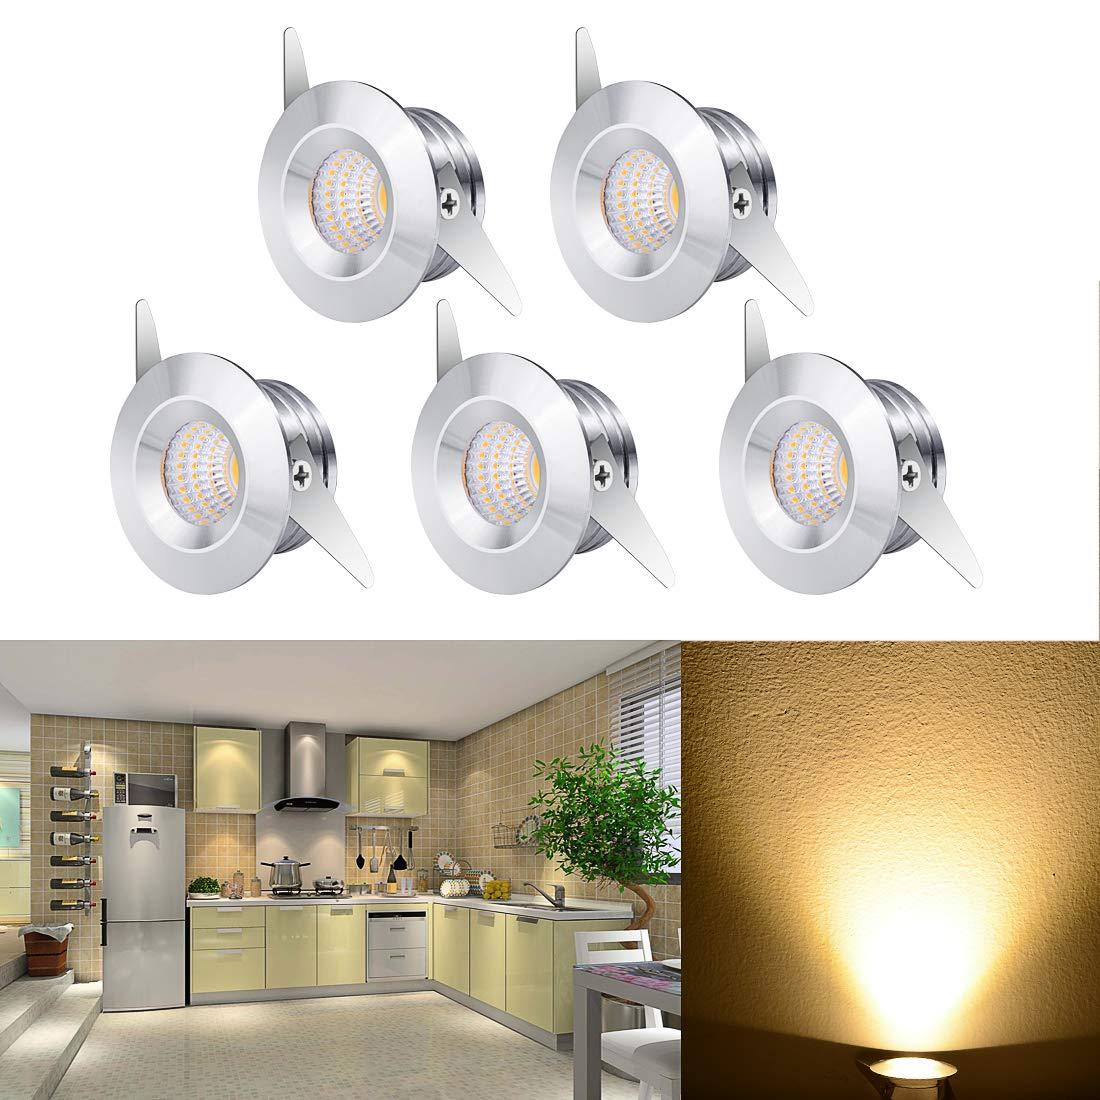 Elitlife 3W LED Small Spot Lamp Ceiling Light with Transformer Flush Mount LED Recessed Ceiling Lights Downlights for Living Room Cabinet etc 5-Pack Small Recessed Ceiling Lights